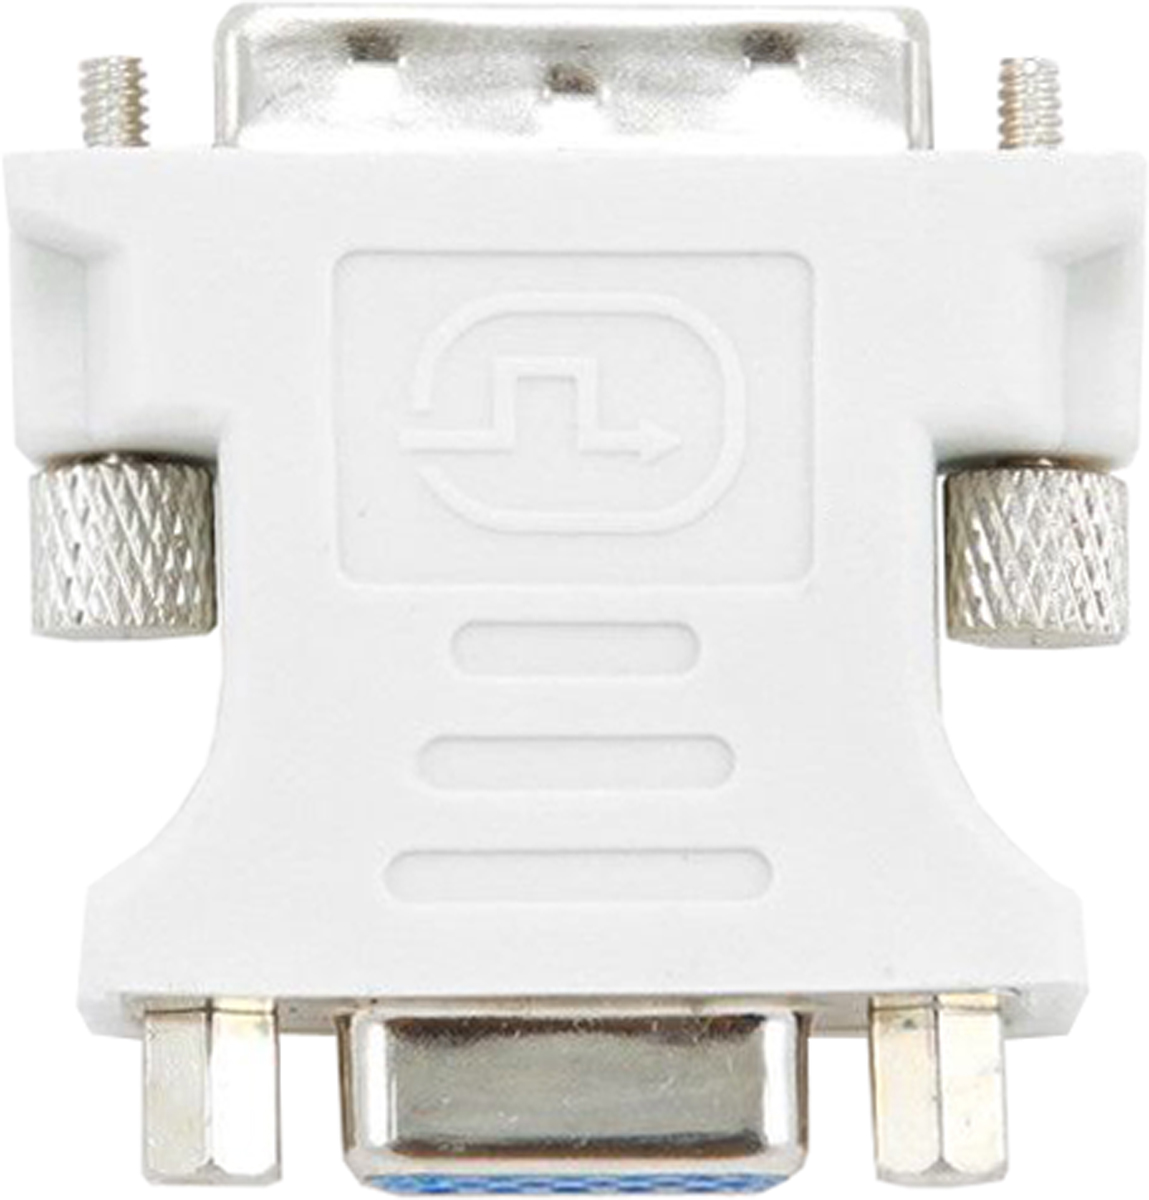 Cablexpert A-DVI-VGA переходник DVI-I-VGA 29M/15F переходник vention dvi i 24 5m vga 15f black